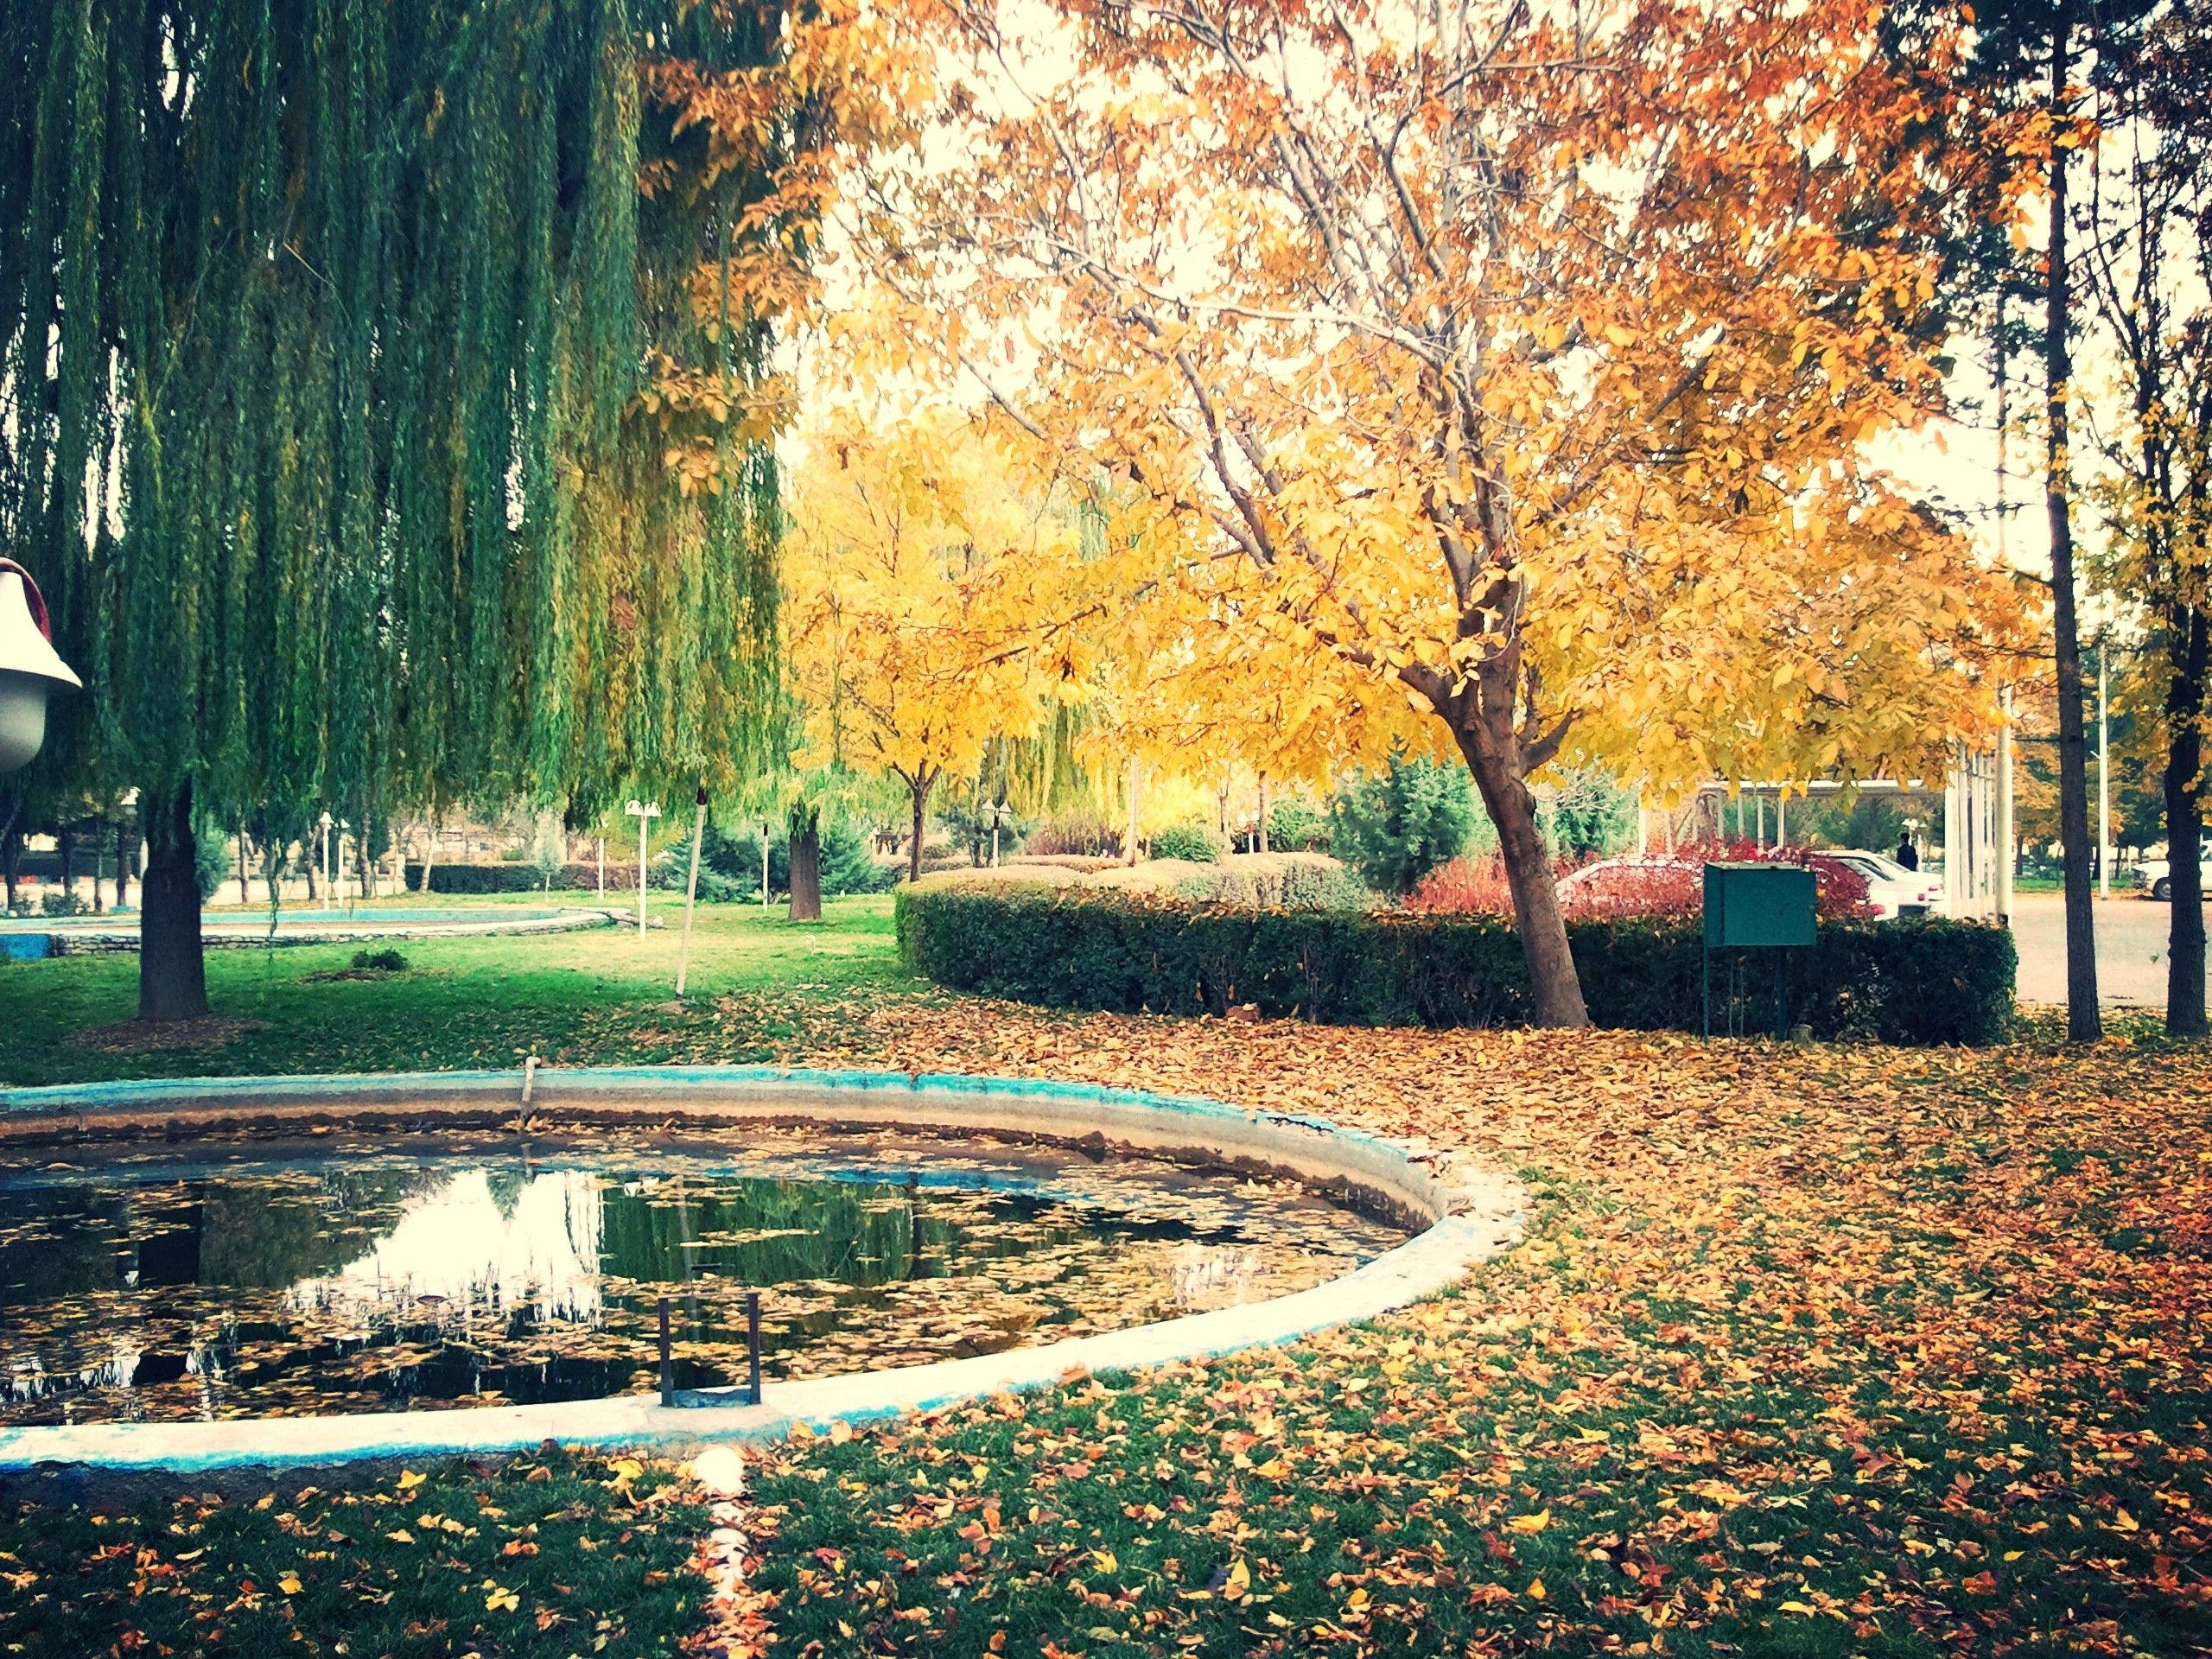 Iran Kermanshah Fall Trees Nature Wallpapers Hd Desktop And Mobile Backgrounds Nature Autumn Scenery Green Nature